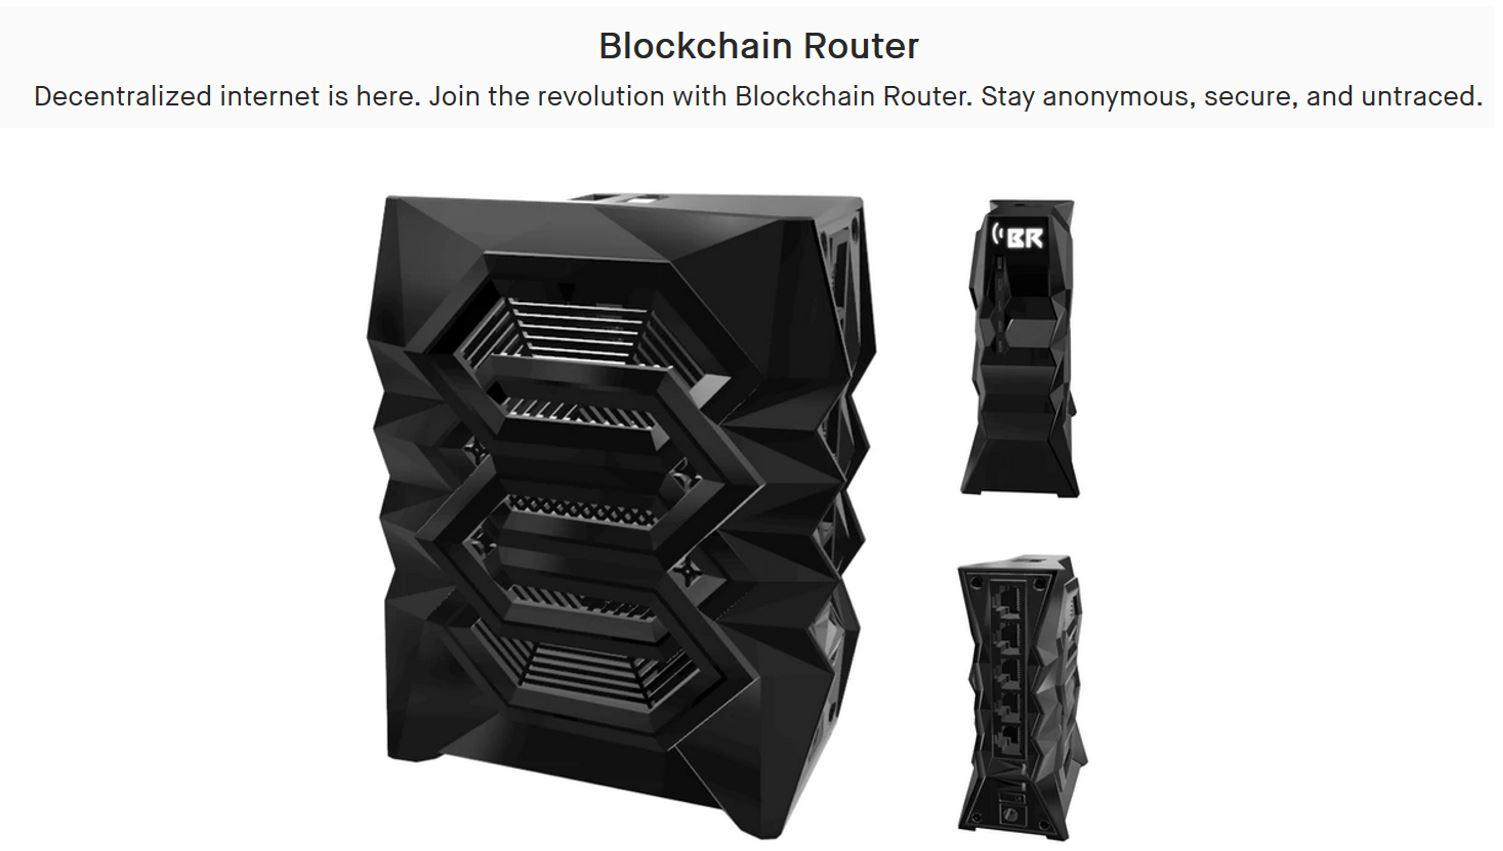 Blockchain Router Image